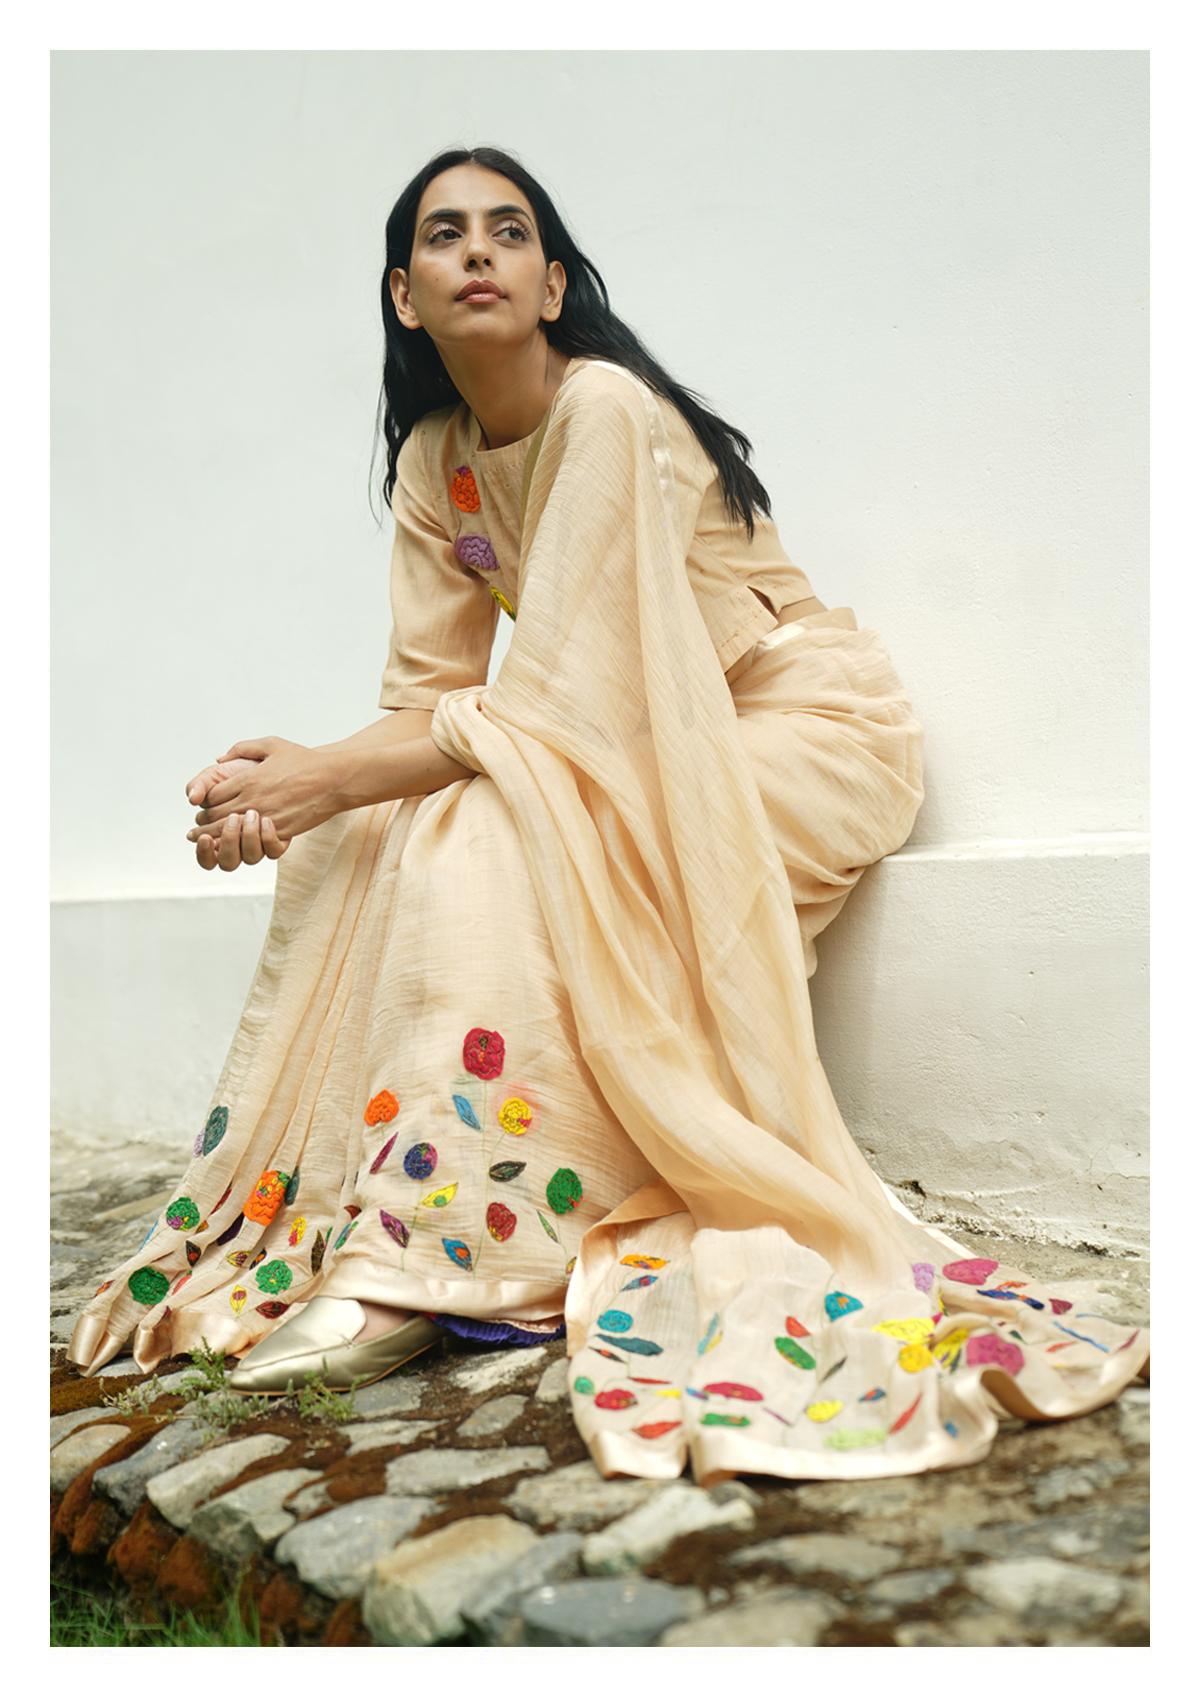 Panna Applique Chanderi Saree